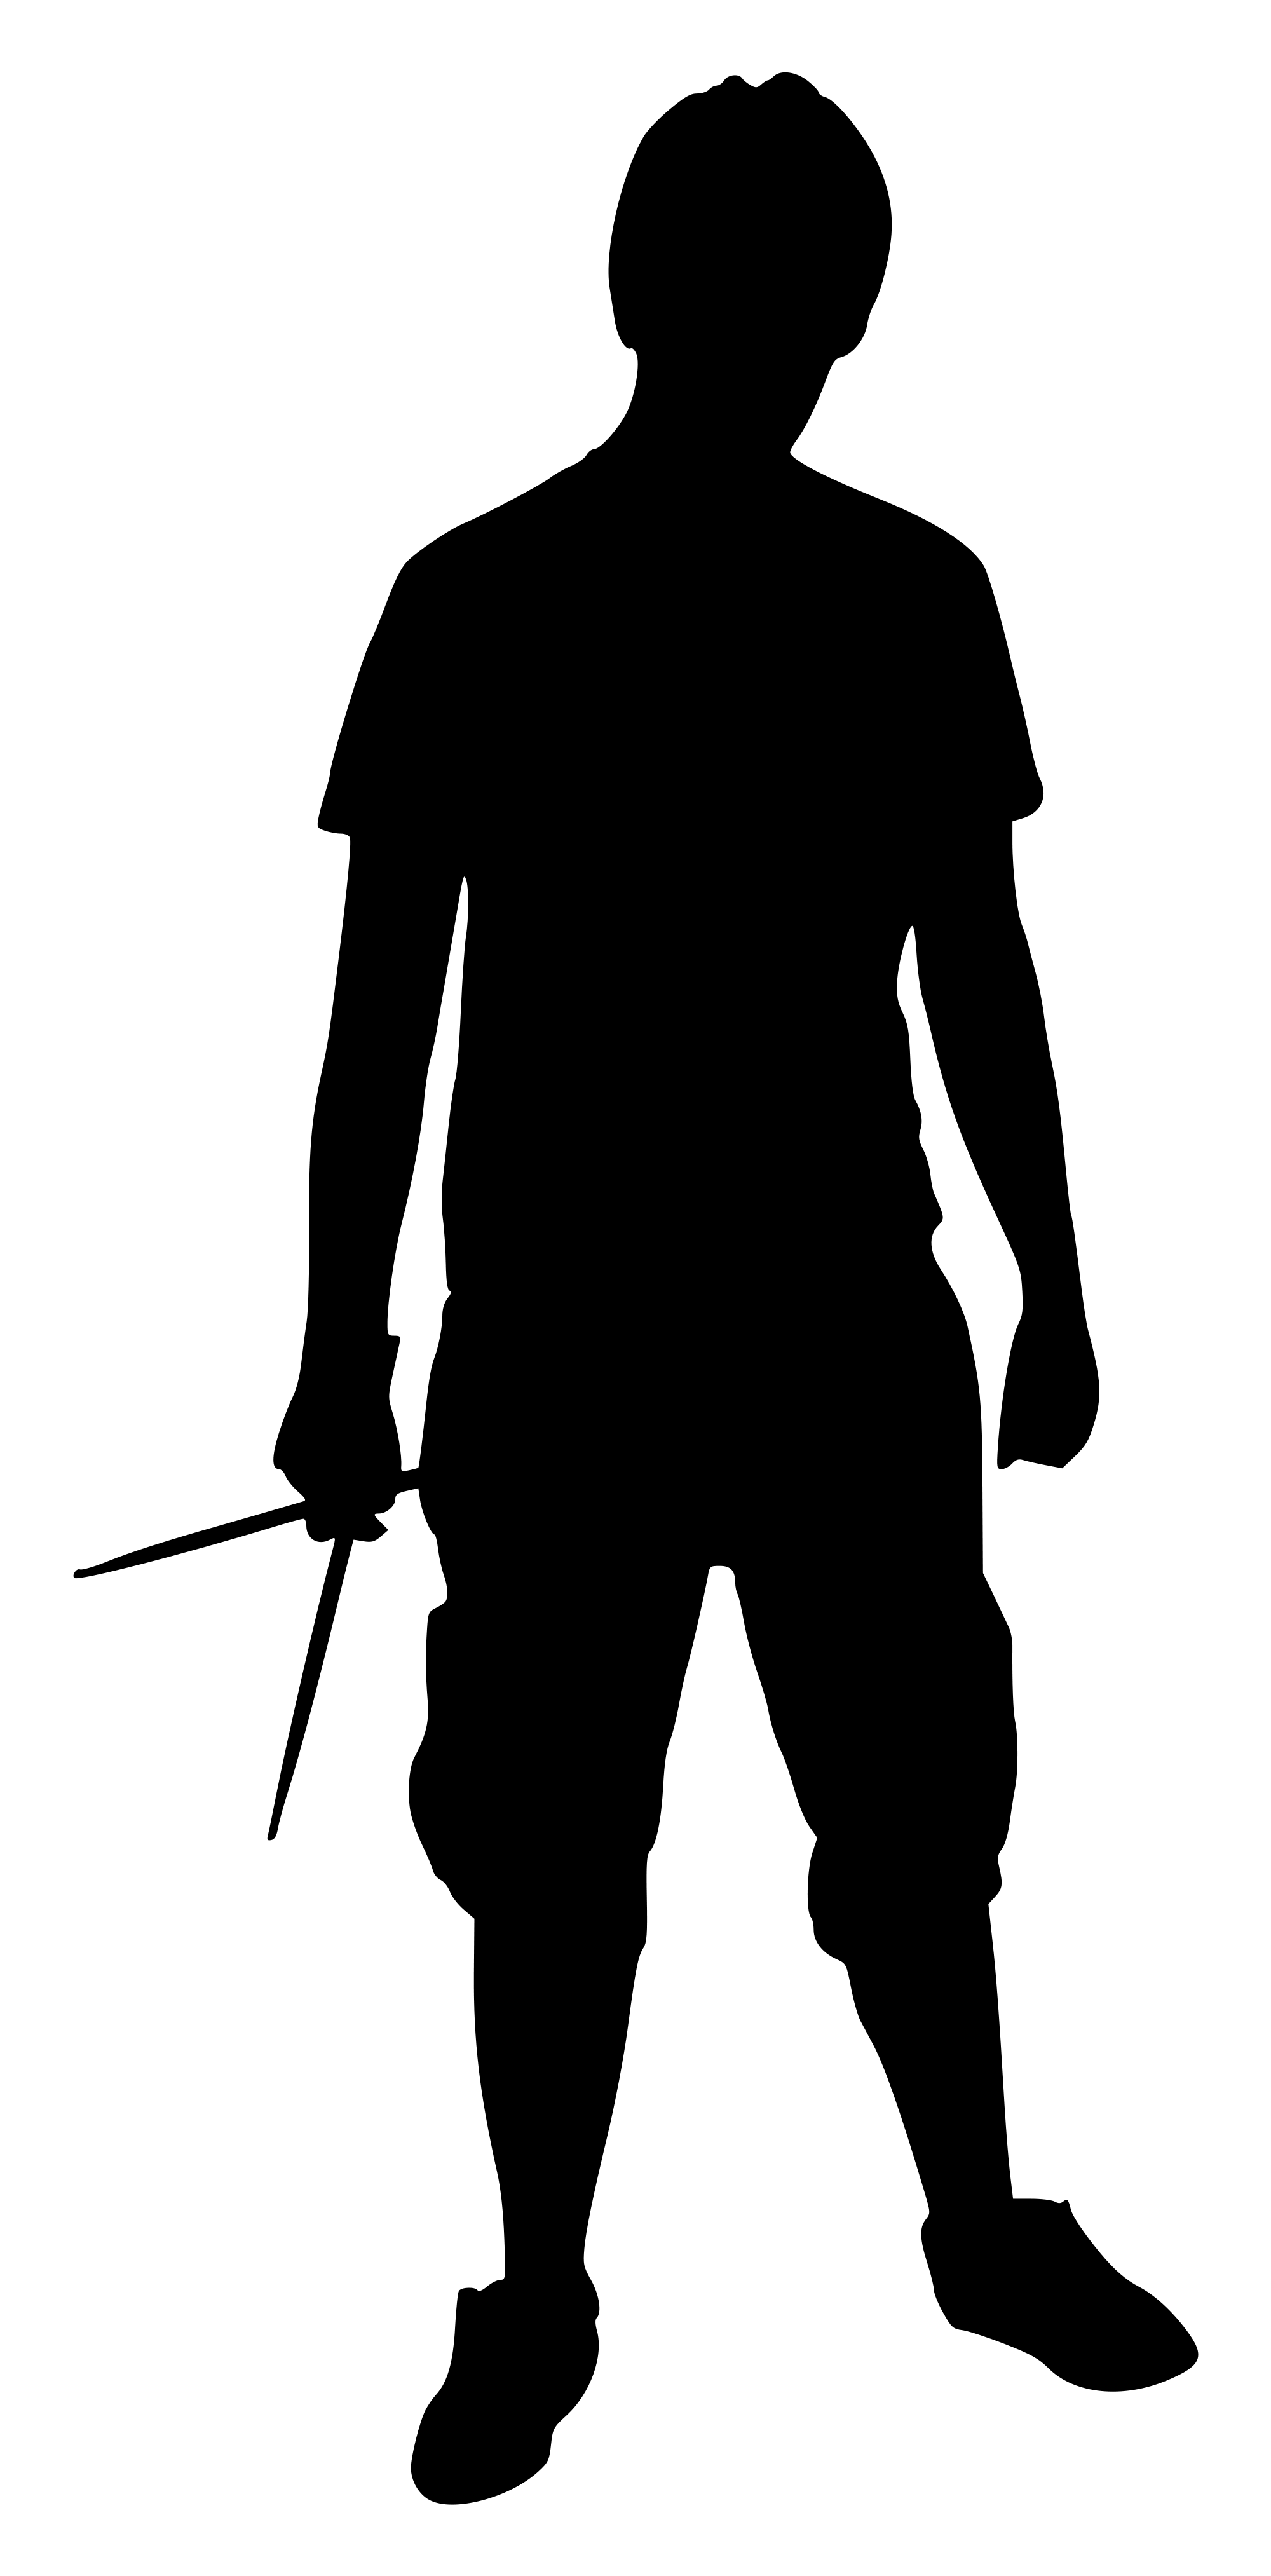 2000x4053 Fileband Silhouette 05.svg